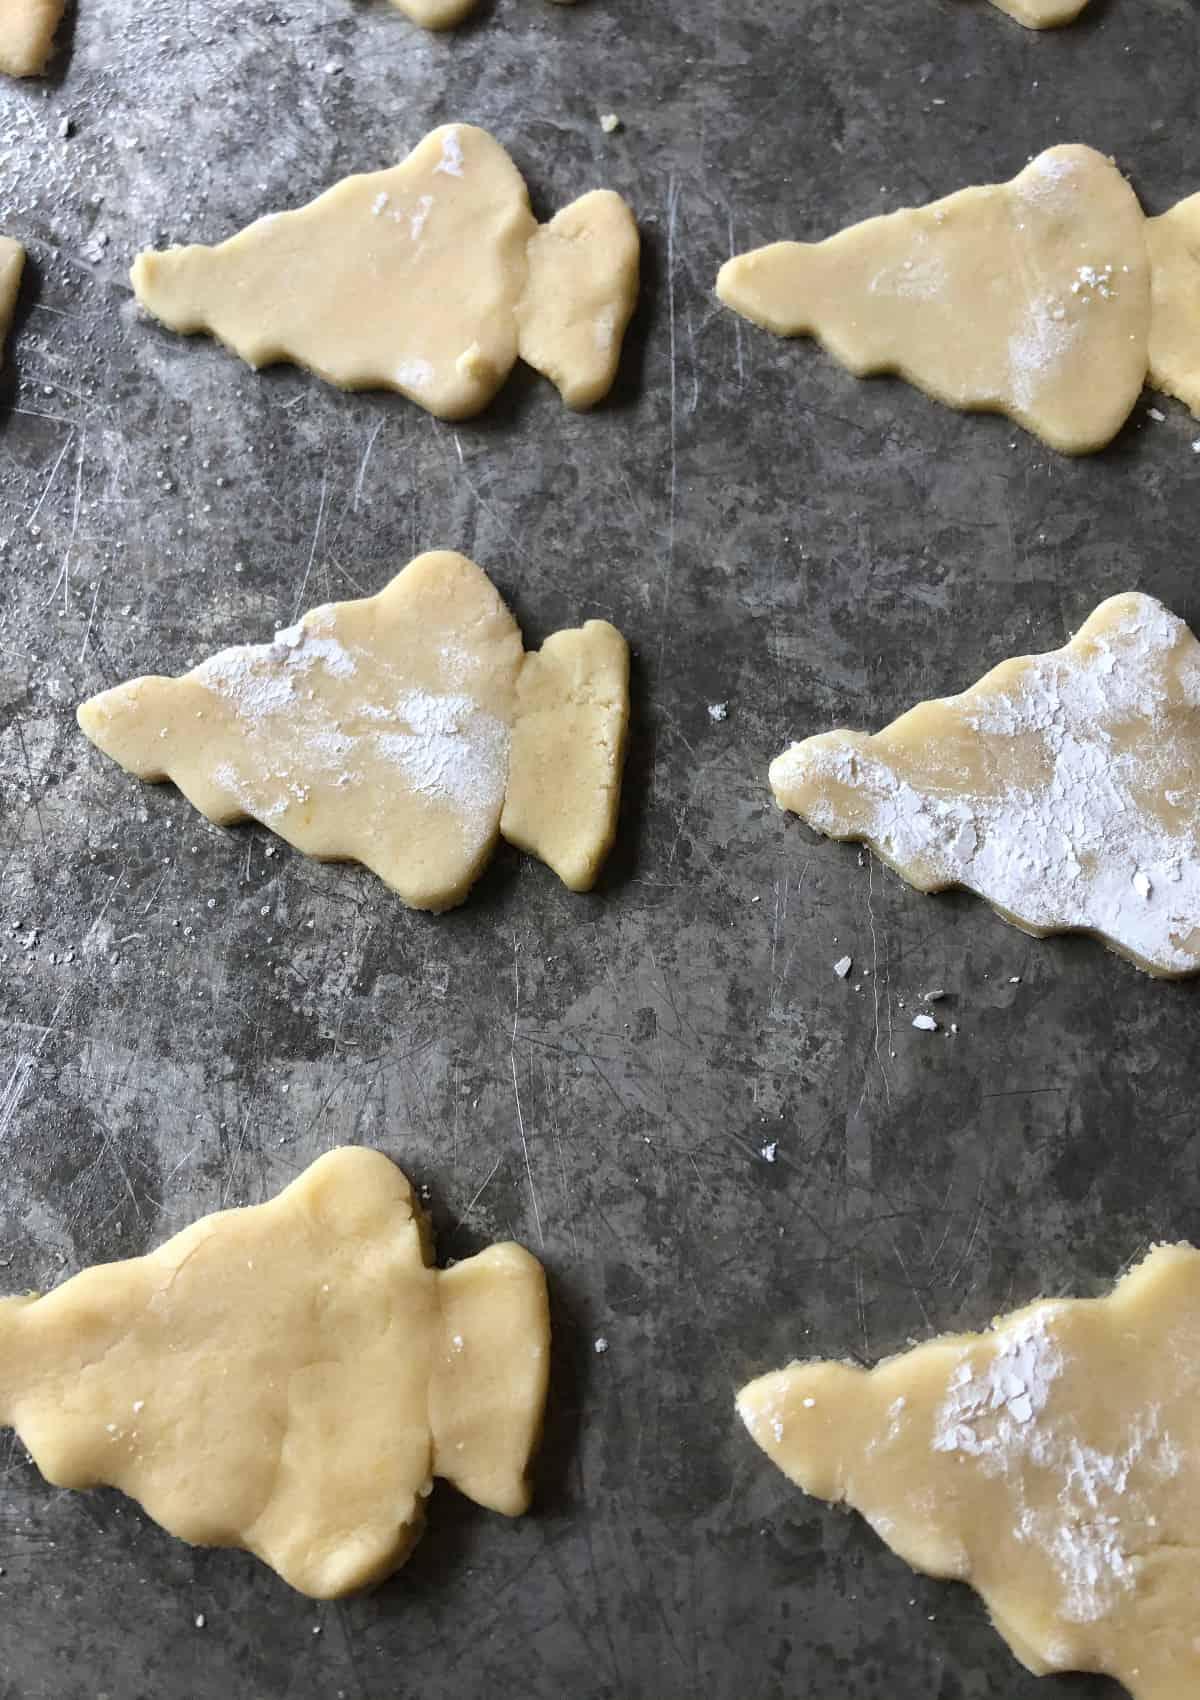 arrowhead cookie dough on a cookie sheet